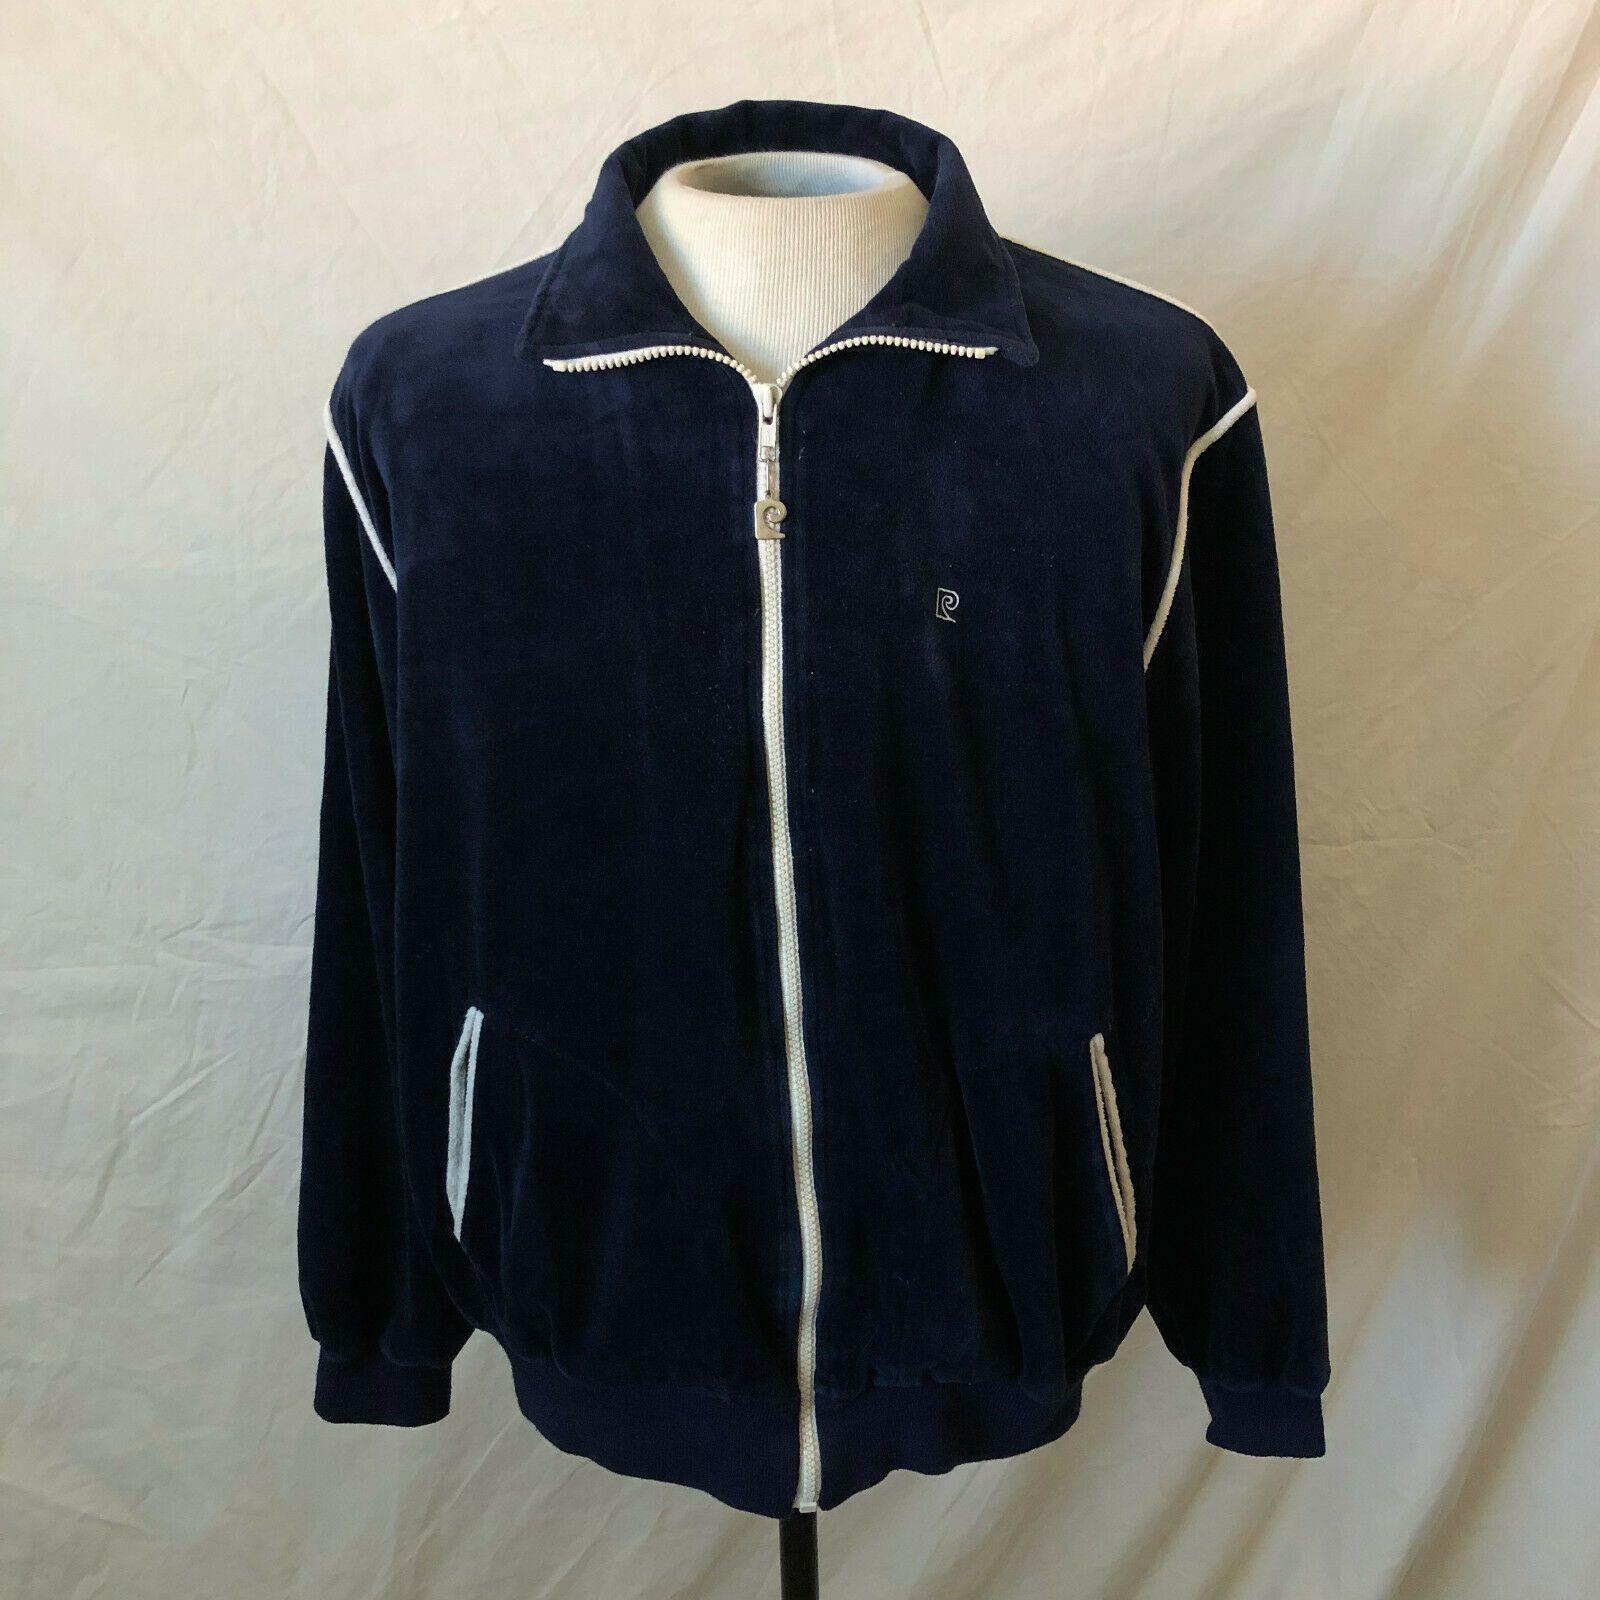 Vintage 80s Pierre Cardin Velour Zip Up Track Jacket Medium Blue Vtg Designer Track Jackets Zip Ups Medium Blue